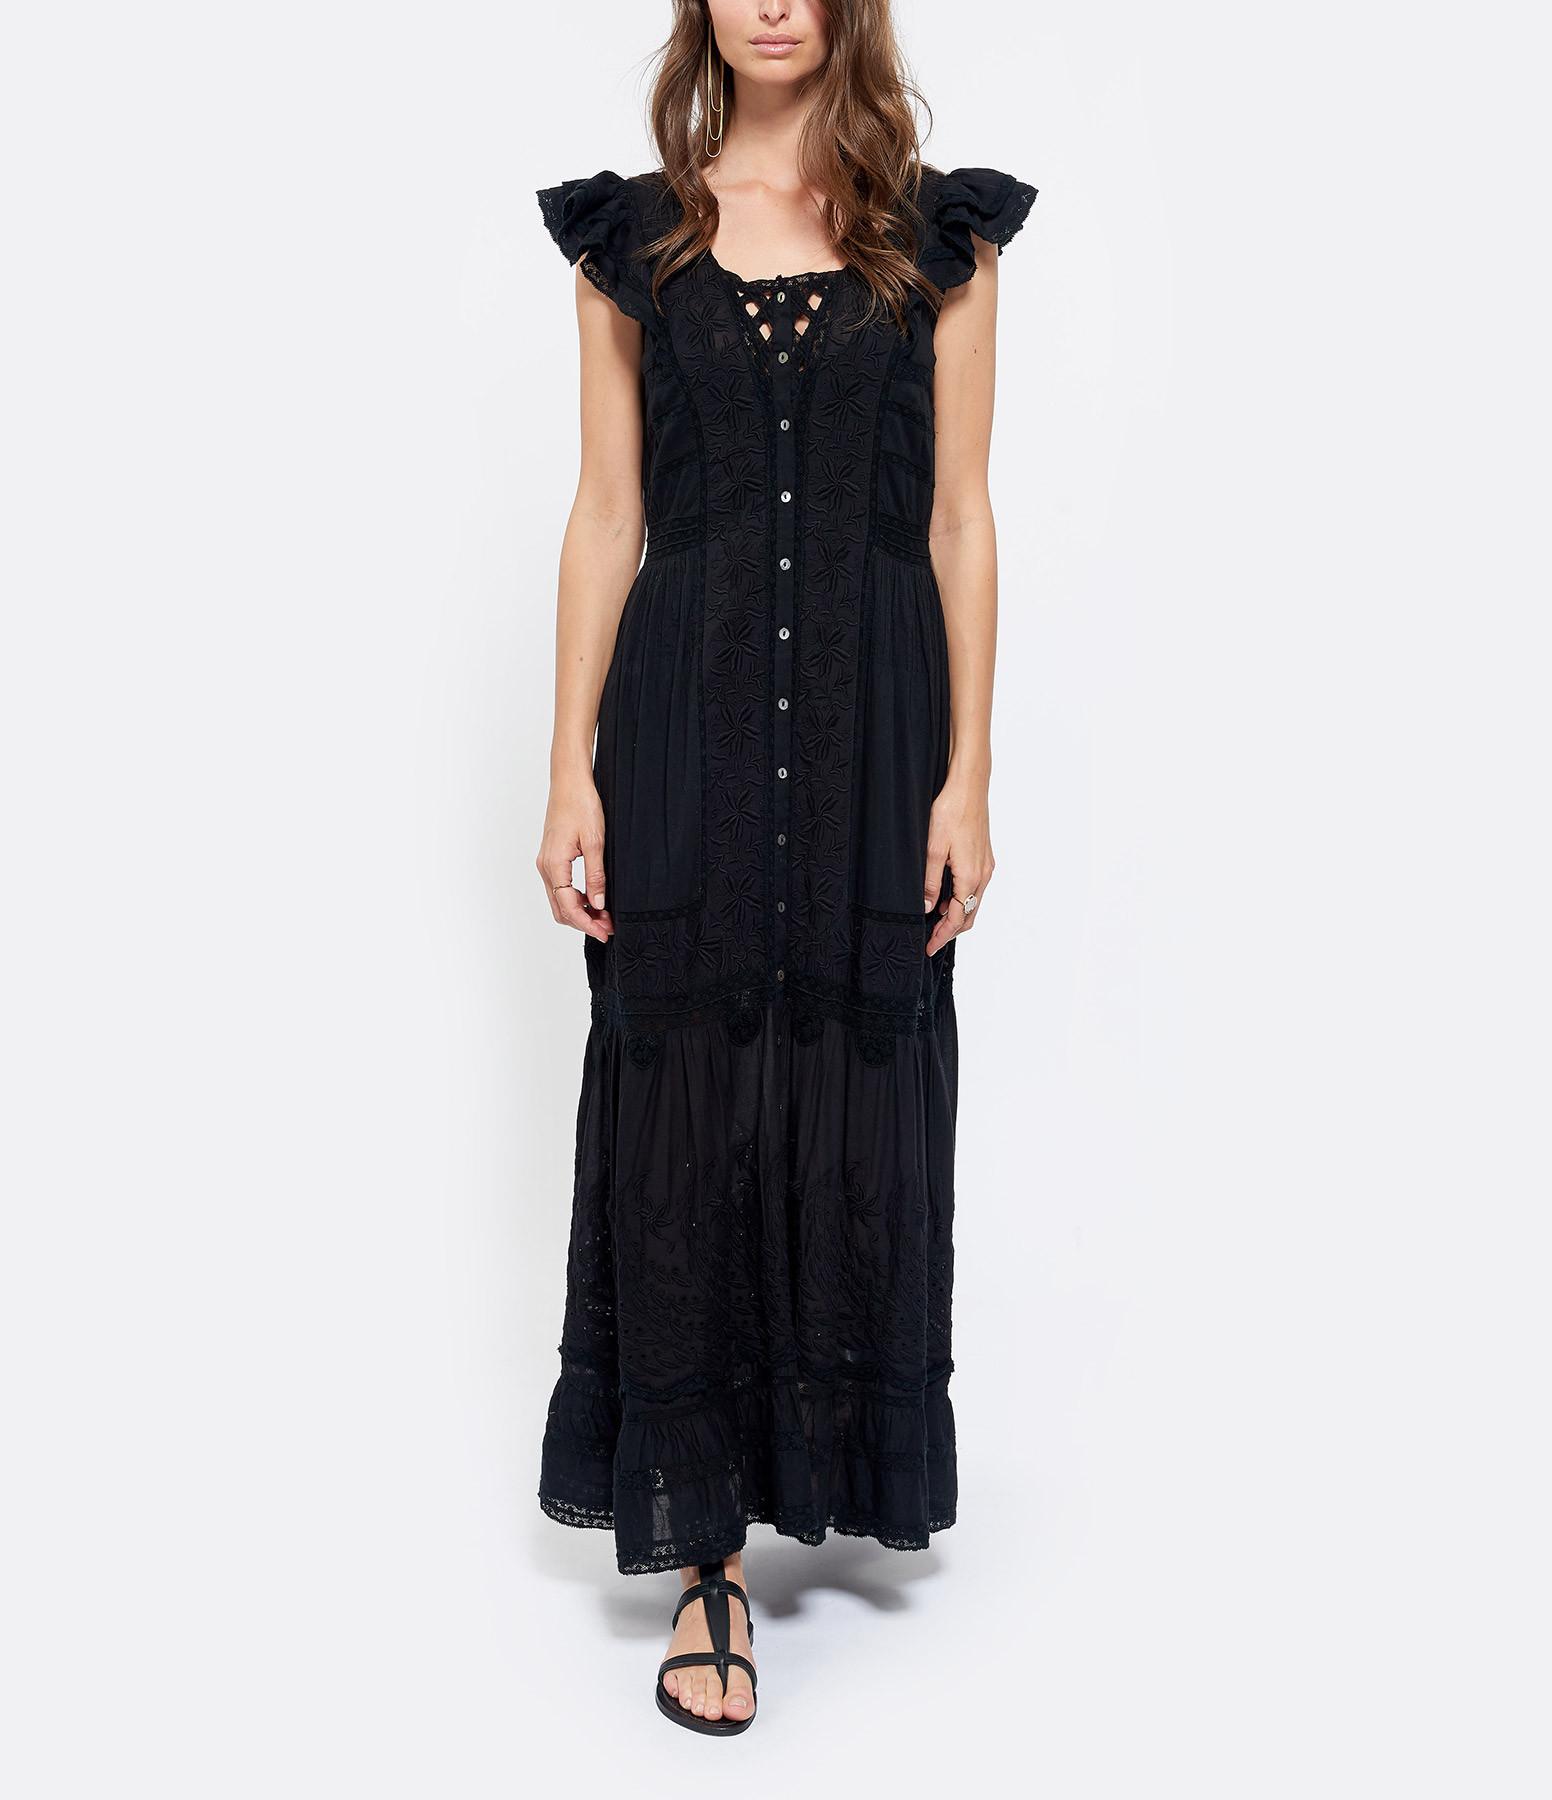 LOVE SHACK FANCY - Robe Valentina Coton Noir